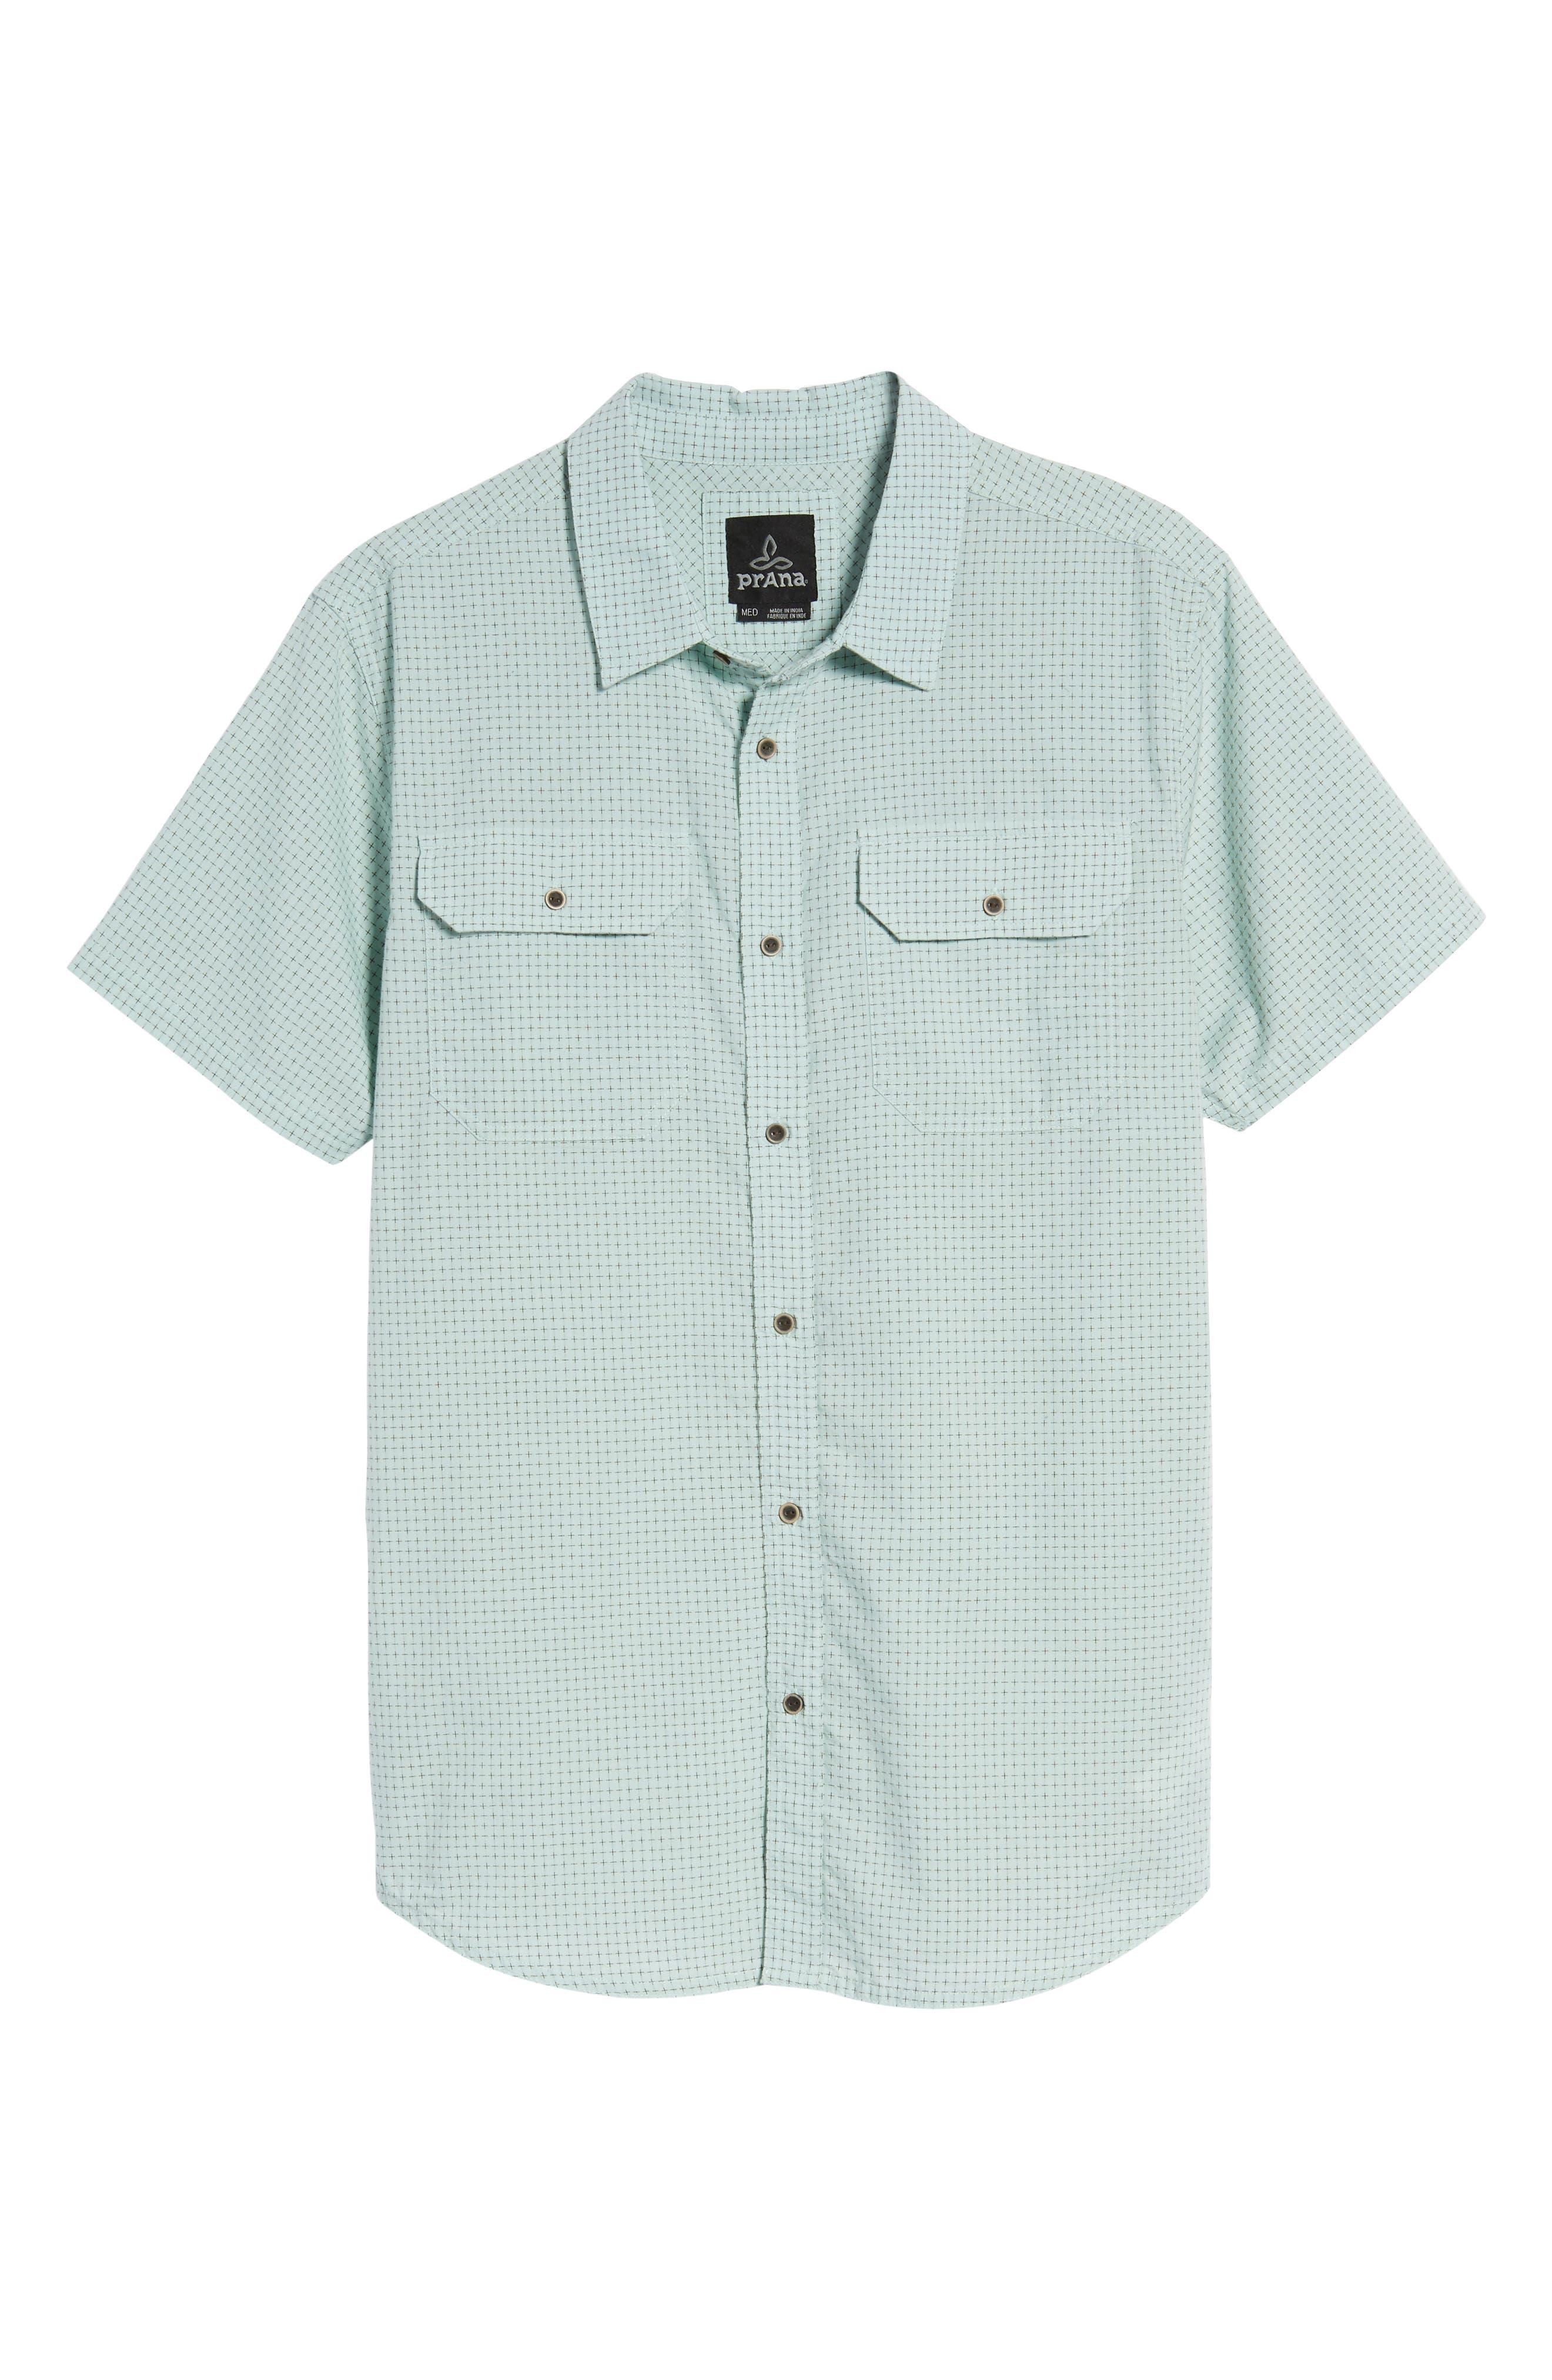 Blakely Slim Fit Short Sleeve Sport Shirt,                             Alternate thumbnail 6, color,                             300